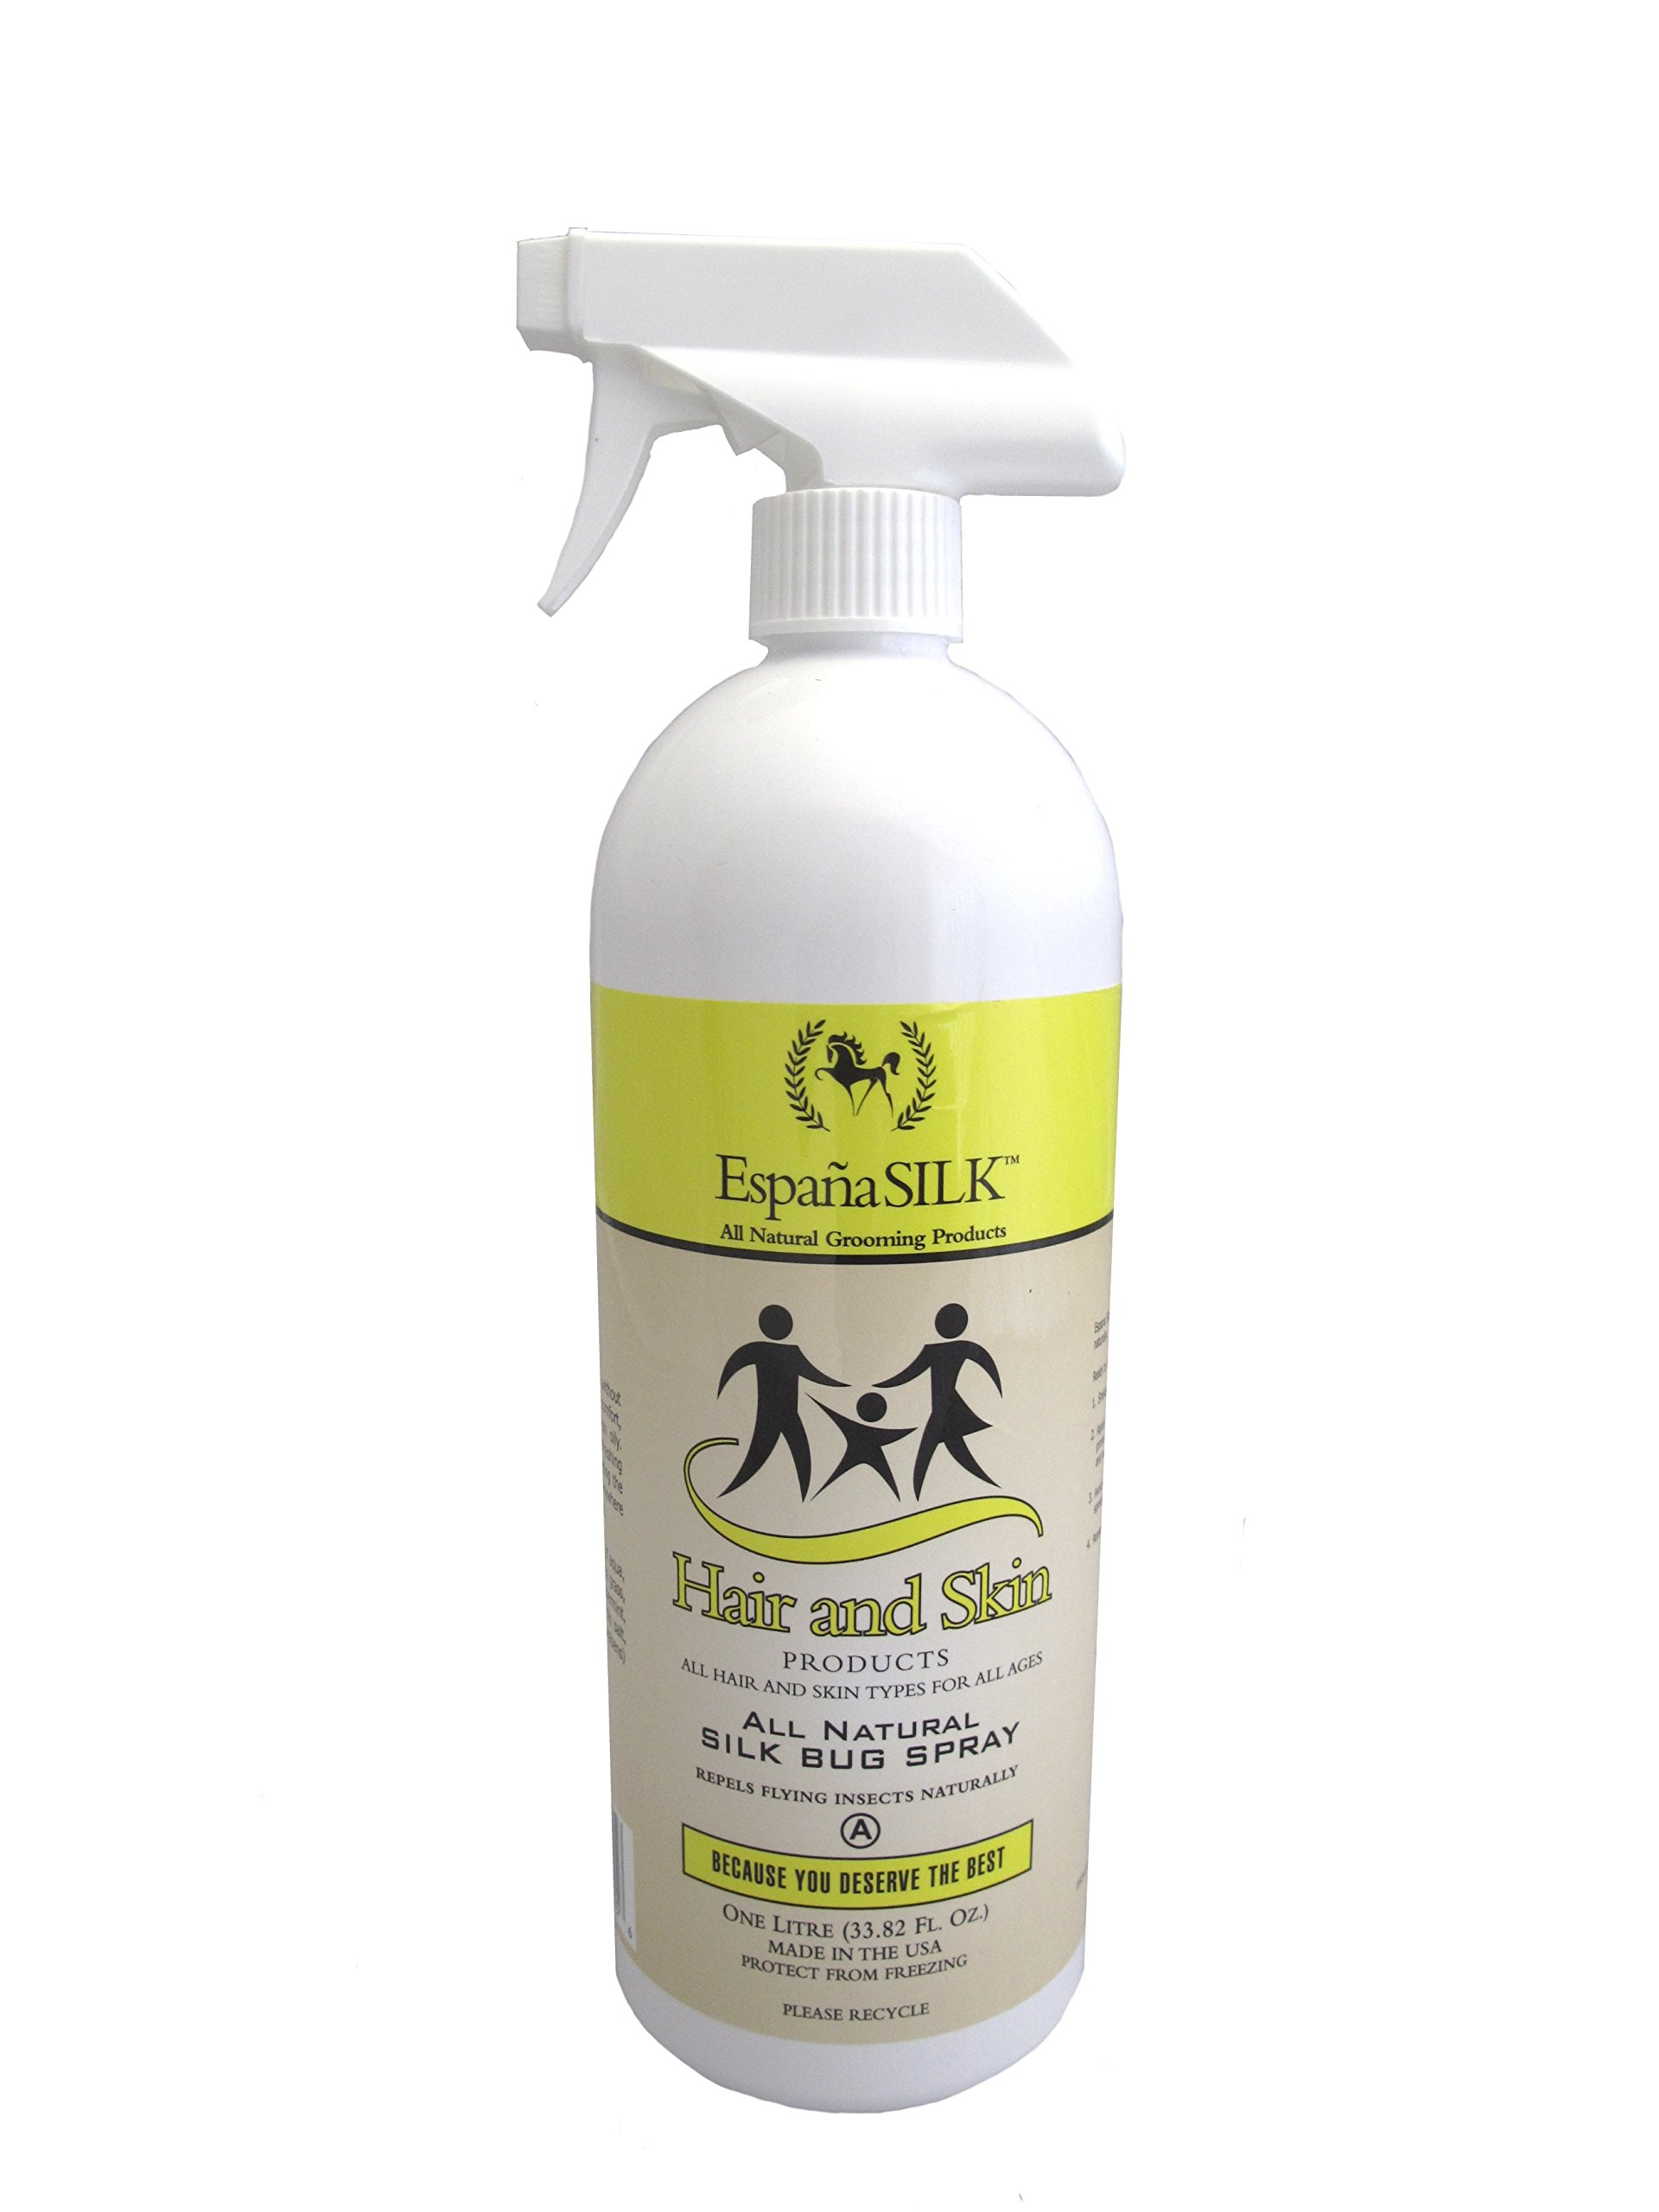 Espana Silk ESP2220P 33.82 oz Protein Natural Bug Spray, 1 L by EspanaSILK